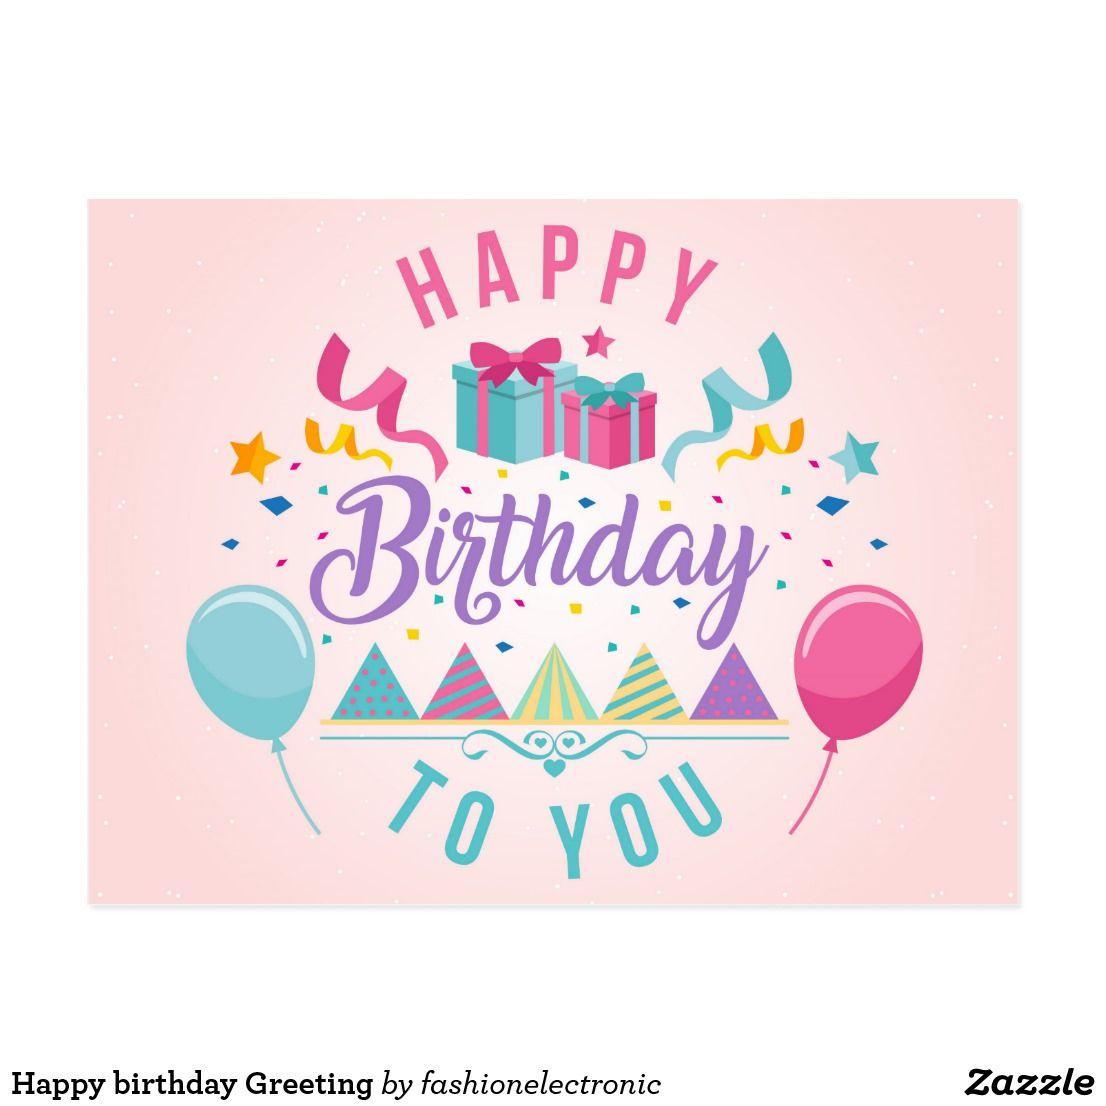 Happy Birthday Greeting Postcard Zazzle Com In 2021 Advance Happy Birthday Happy Birthday Wishes Images Happy Birthday Wishes Cards